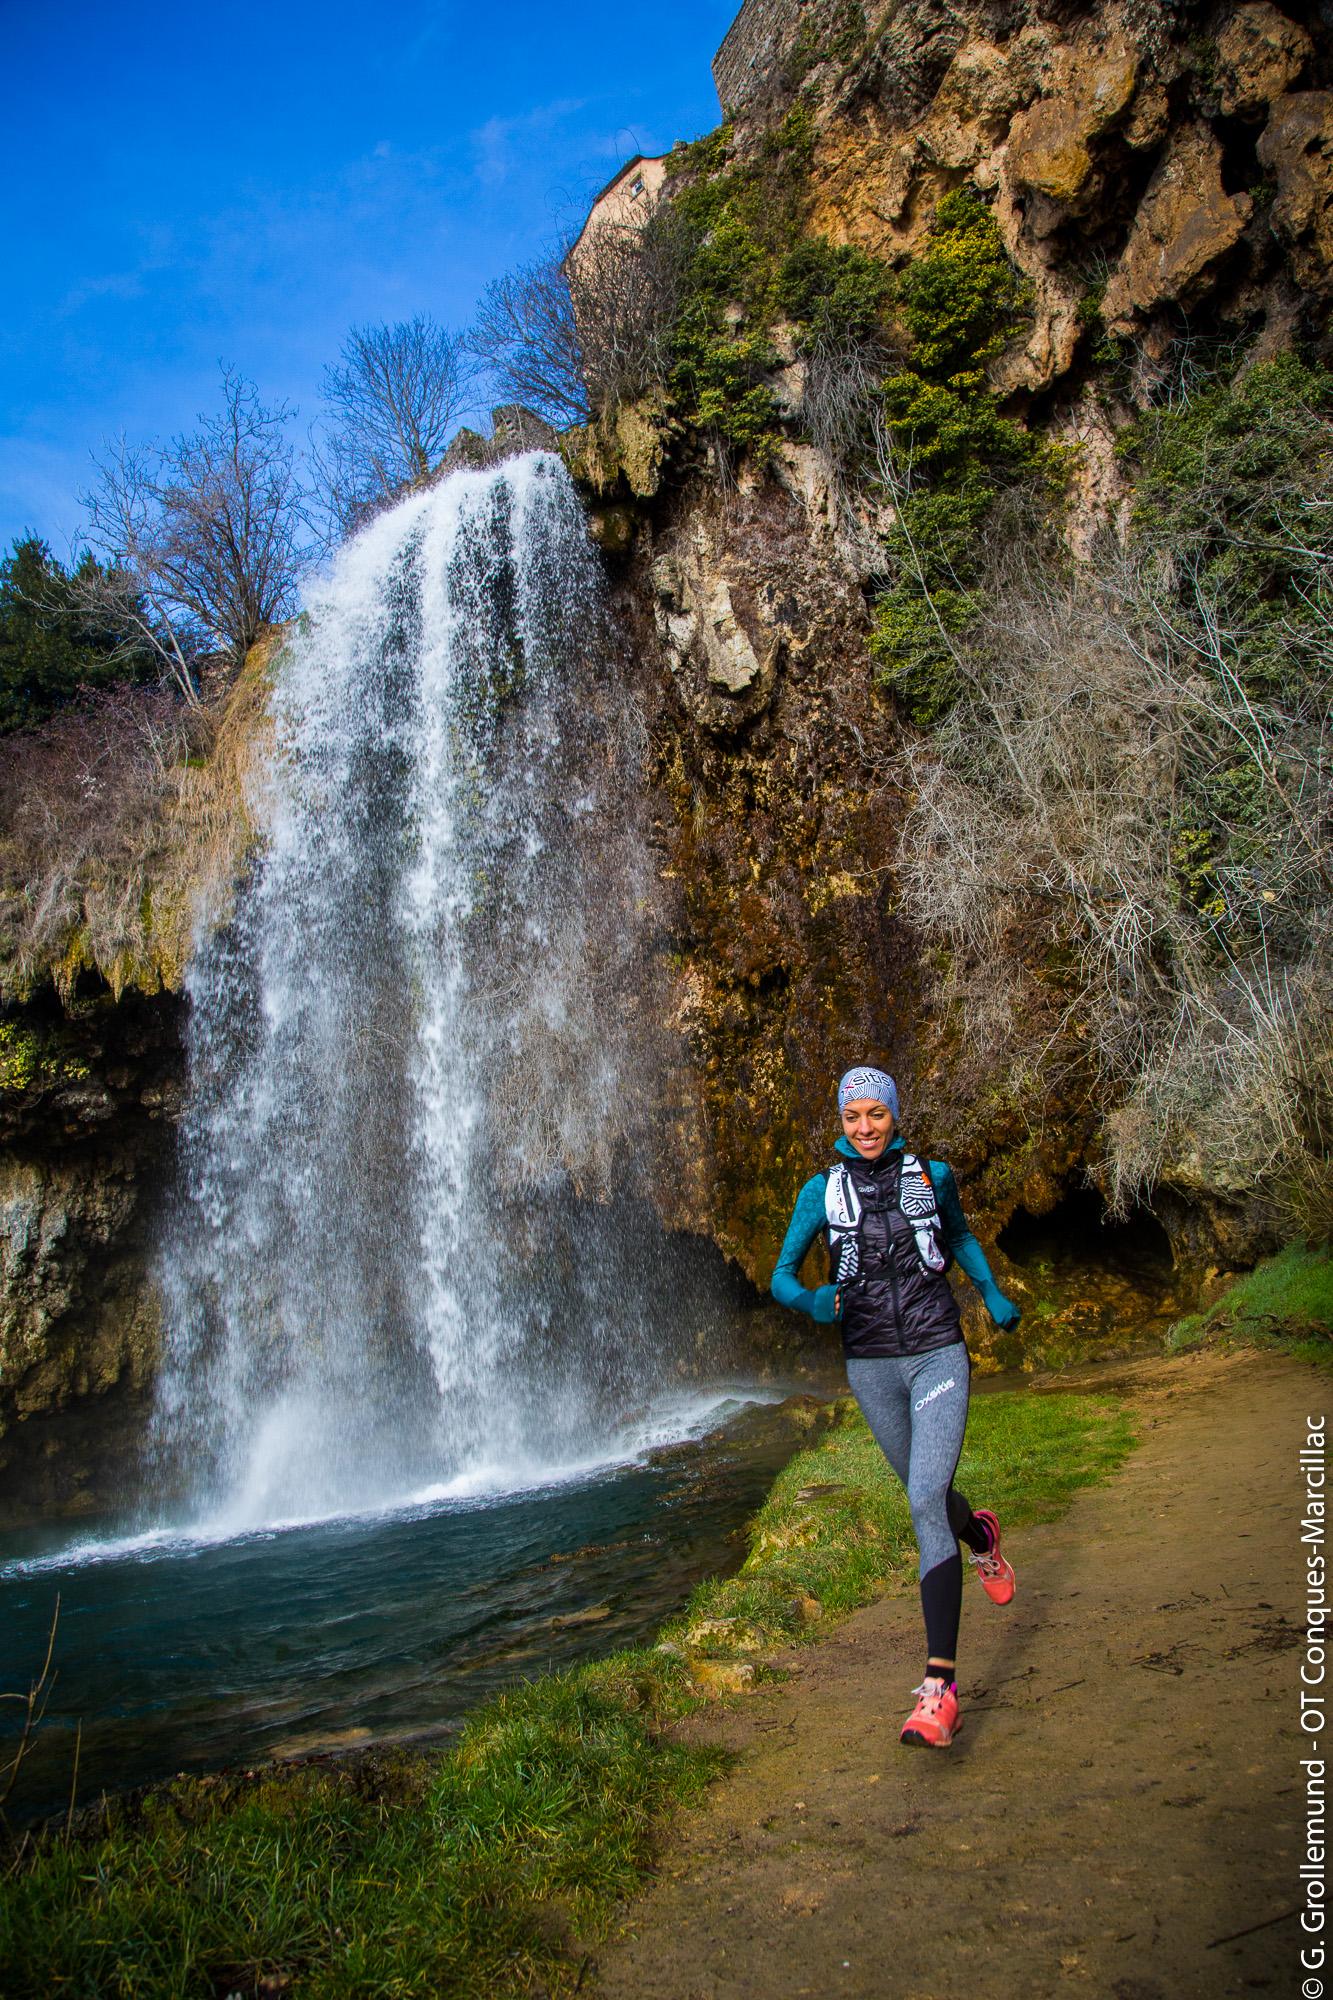 Terra Trail à la cascade de Salles-la-Source